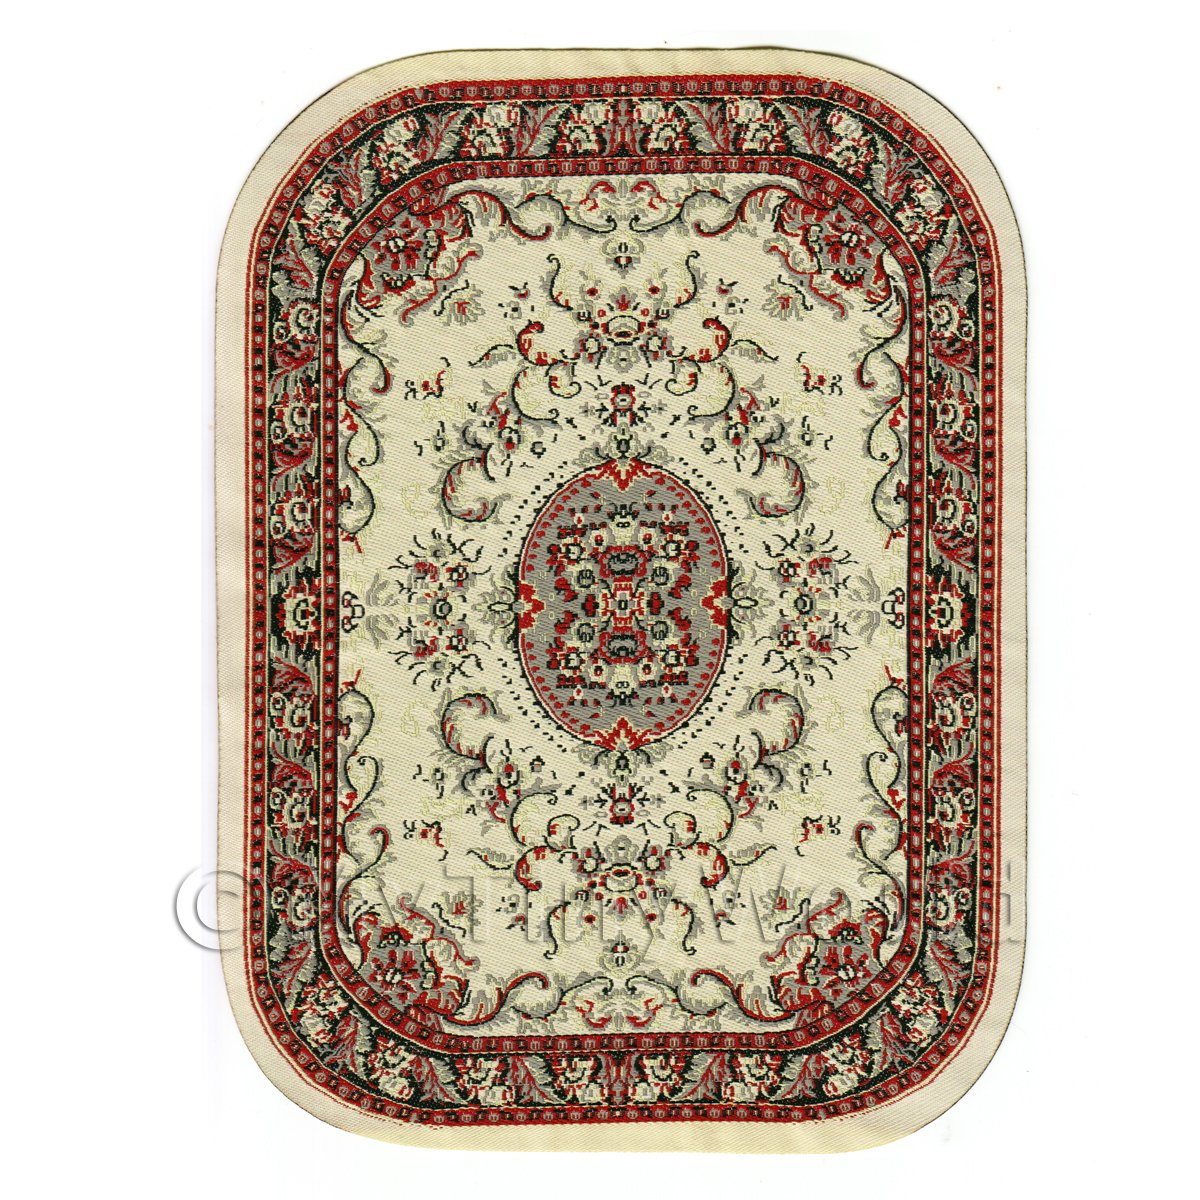 Dolls House Miniature Large Oval Victorian Carpet / Rug